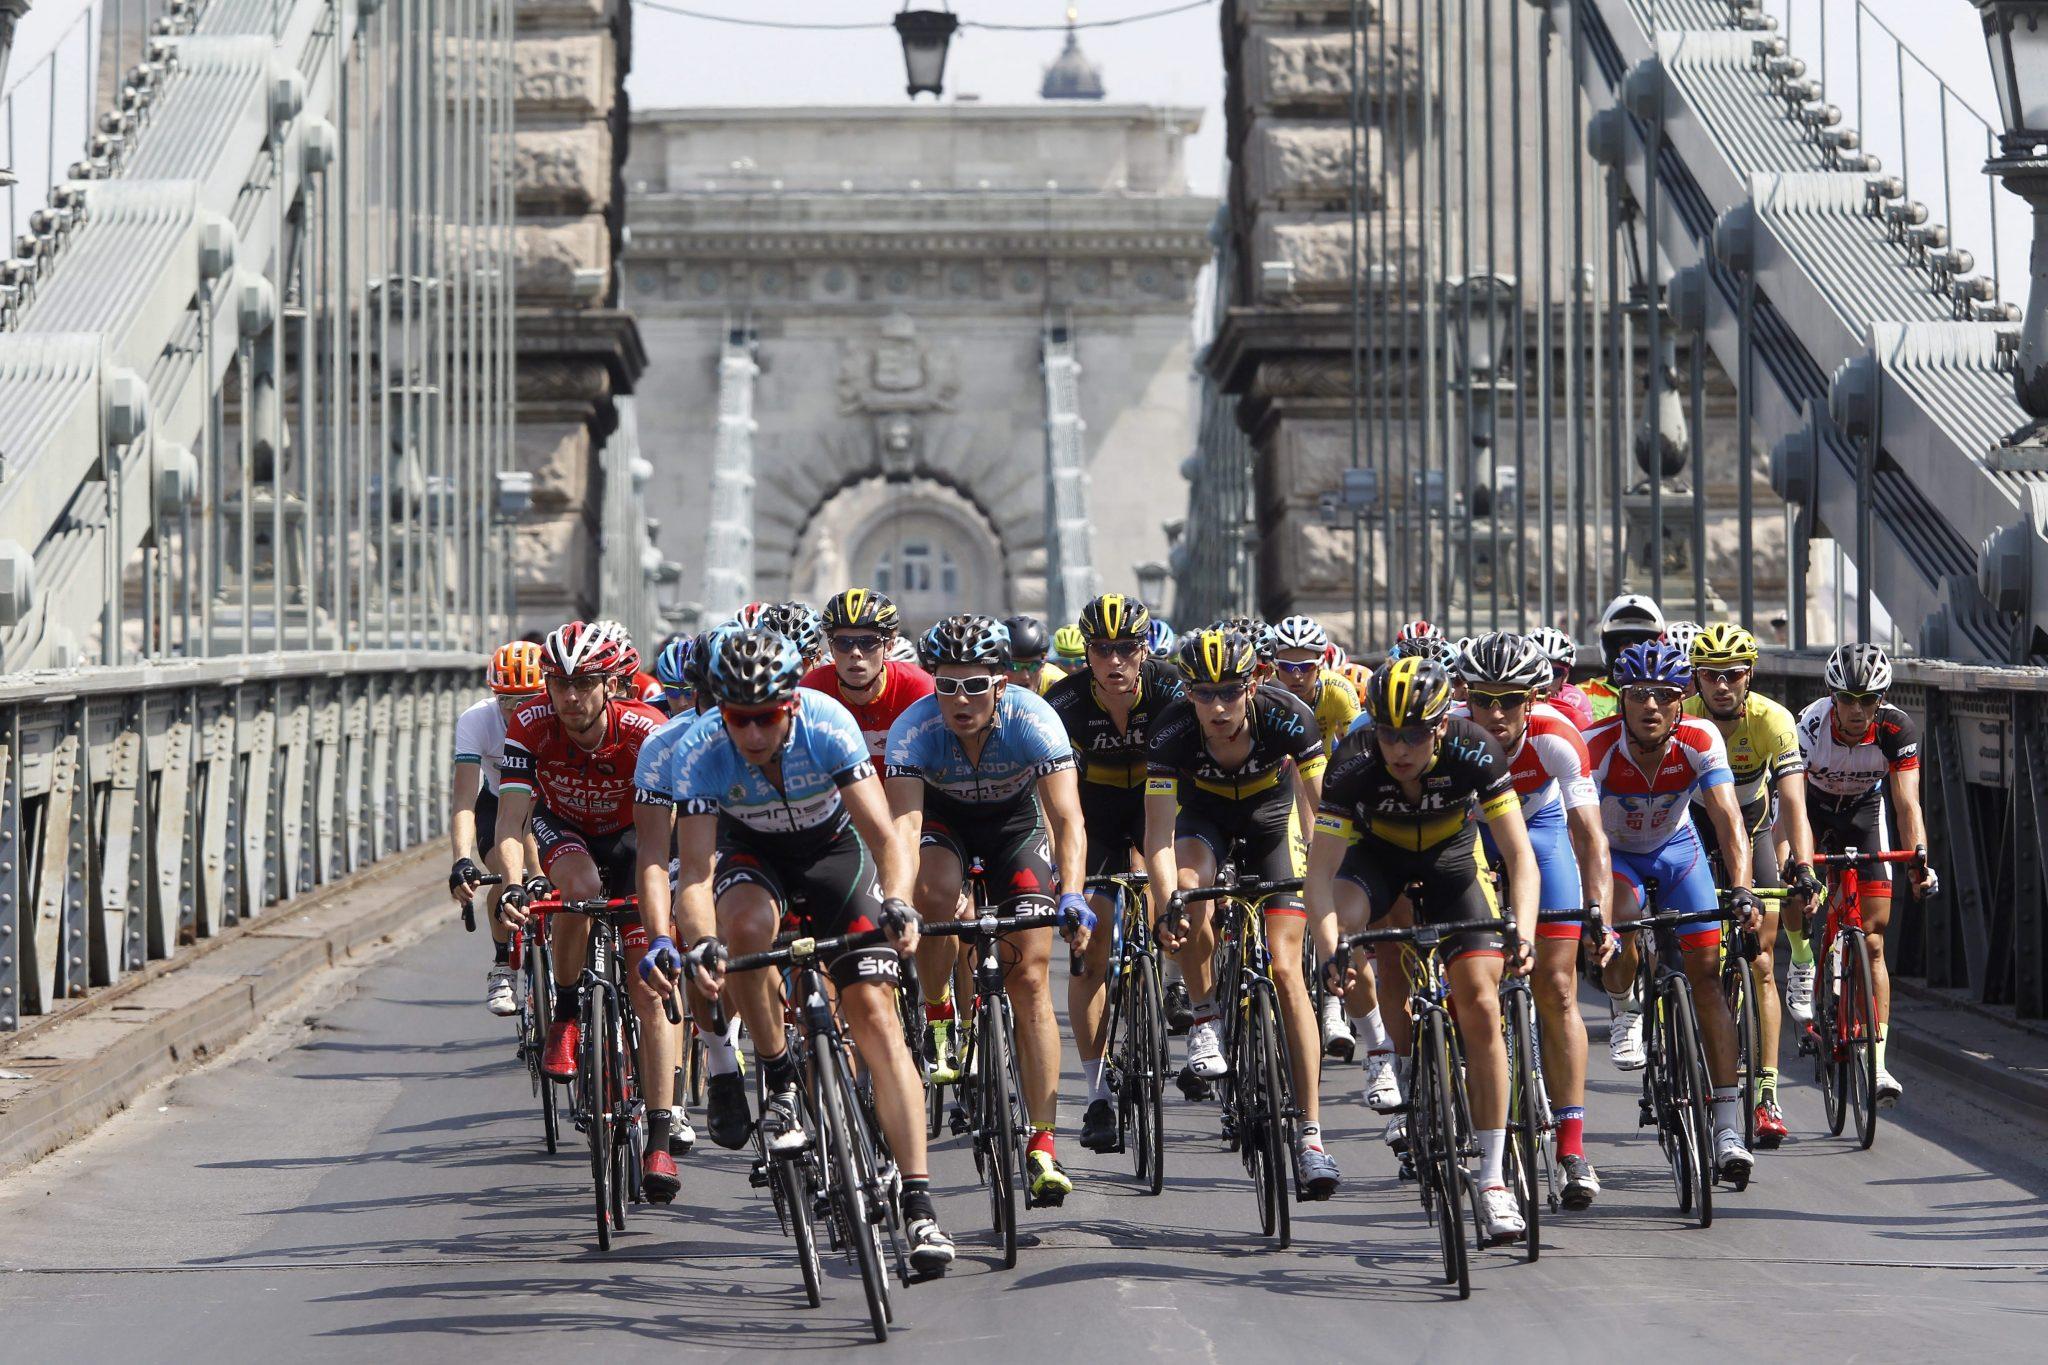 Tour de Hongrie to Launch on August 29 post's picture